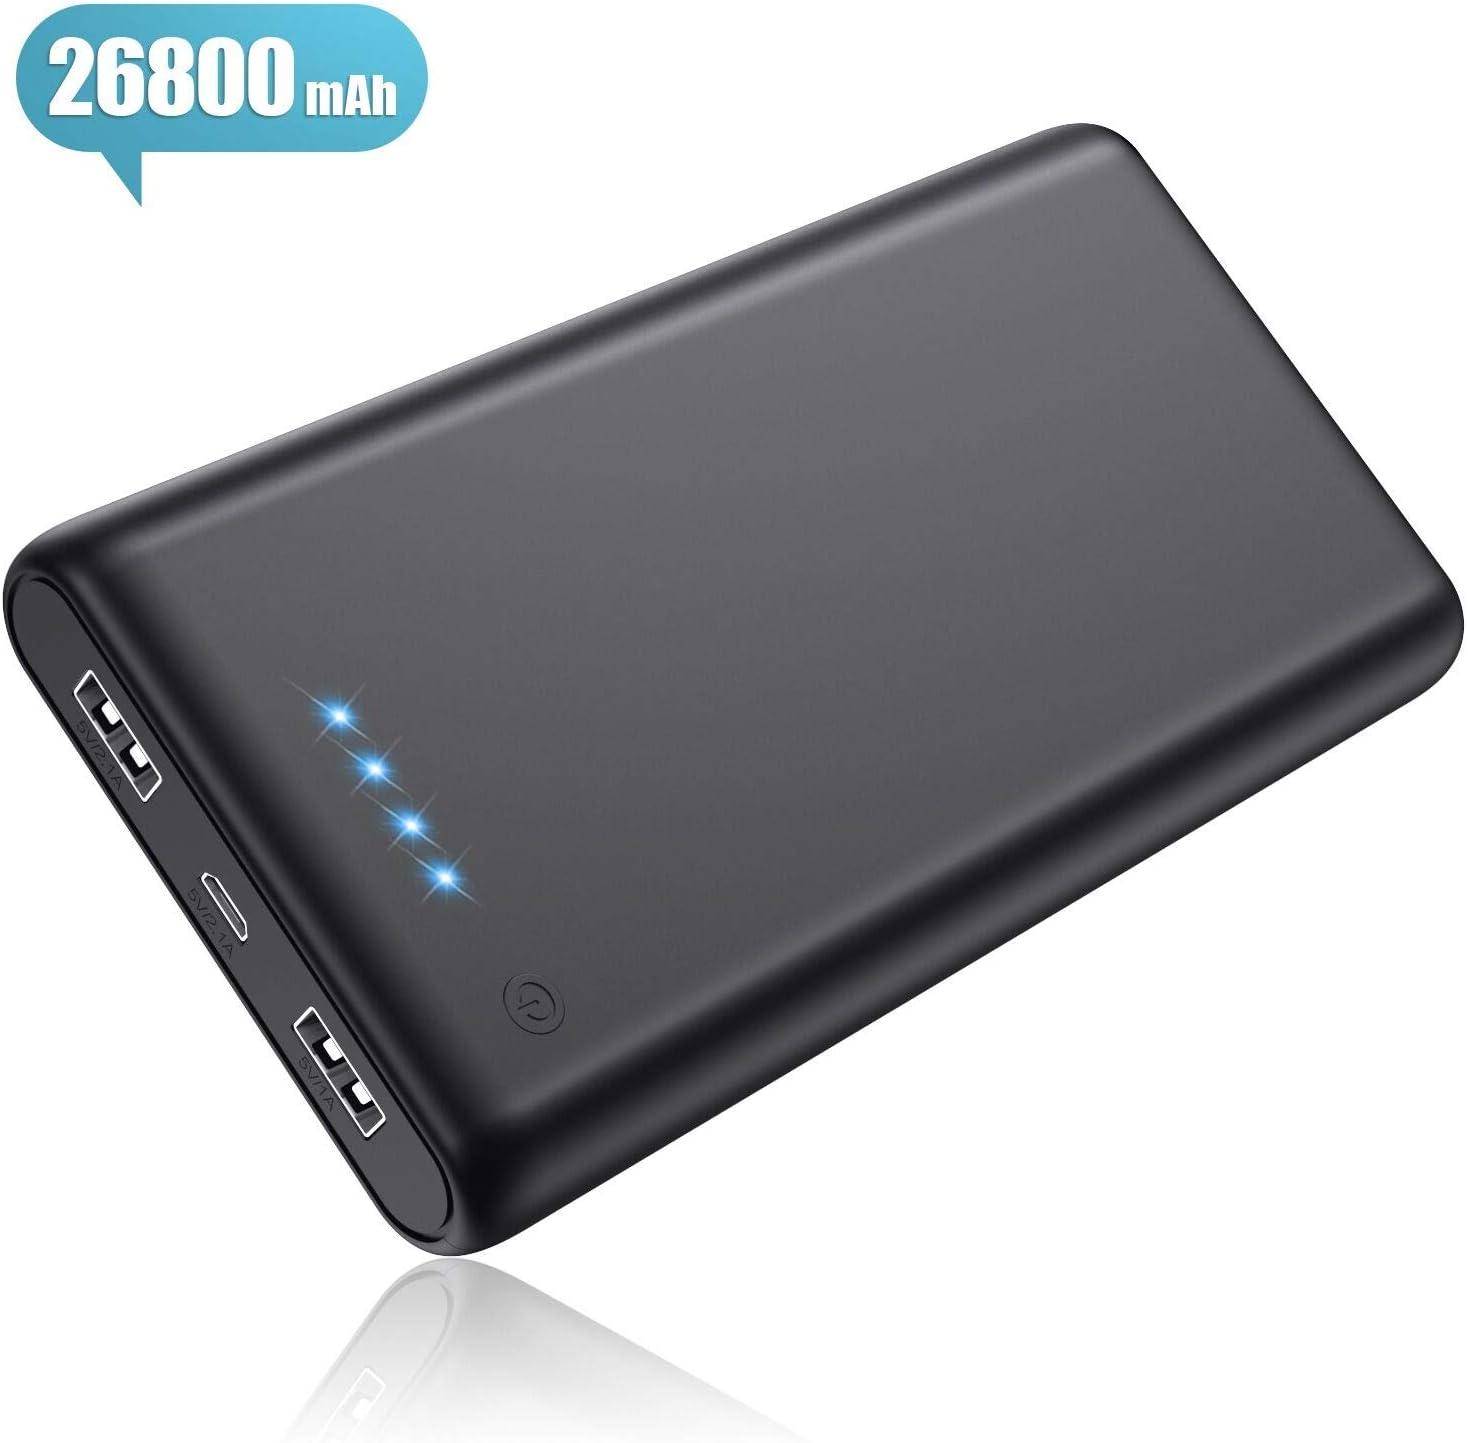 Power Bank 26800mAh,Pxwaxpy Caricabatterie Portatile 2 USB Porte, Alta Capacità...